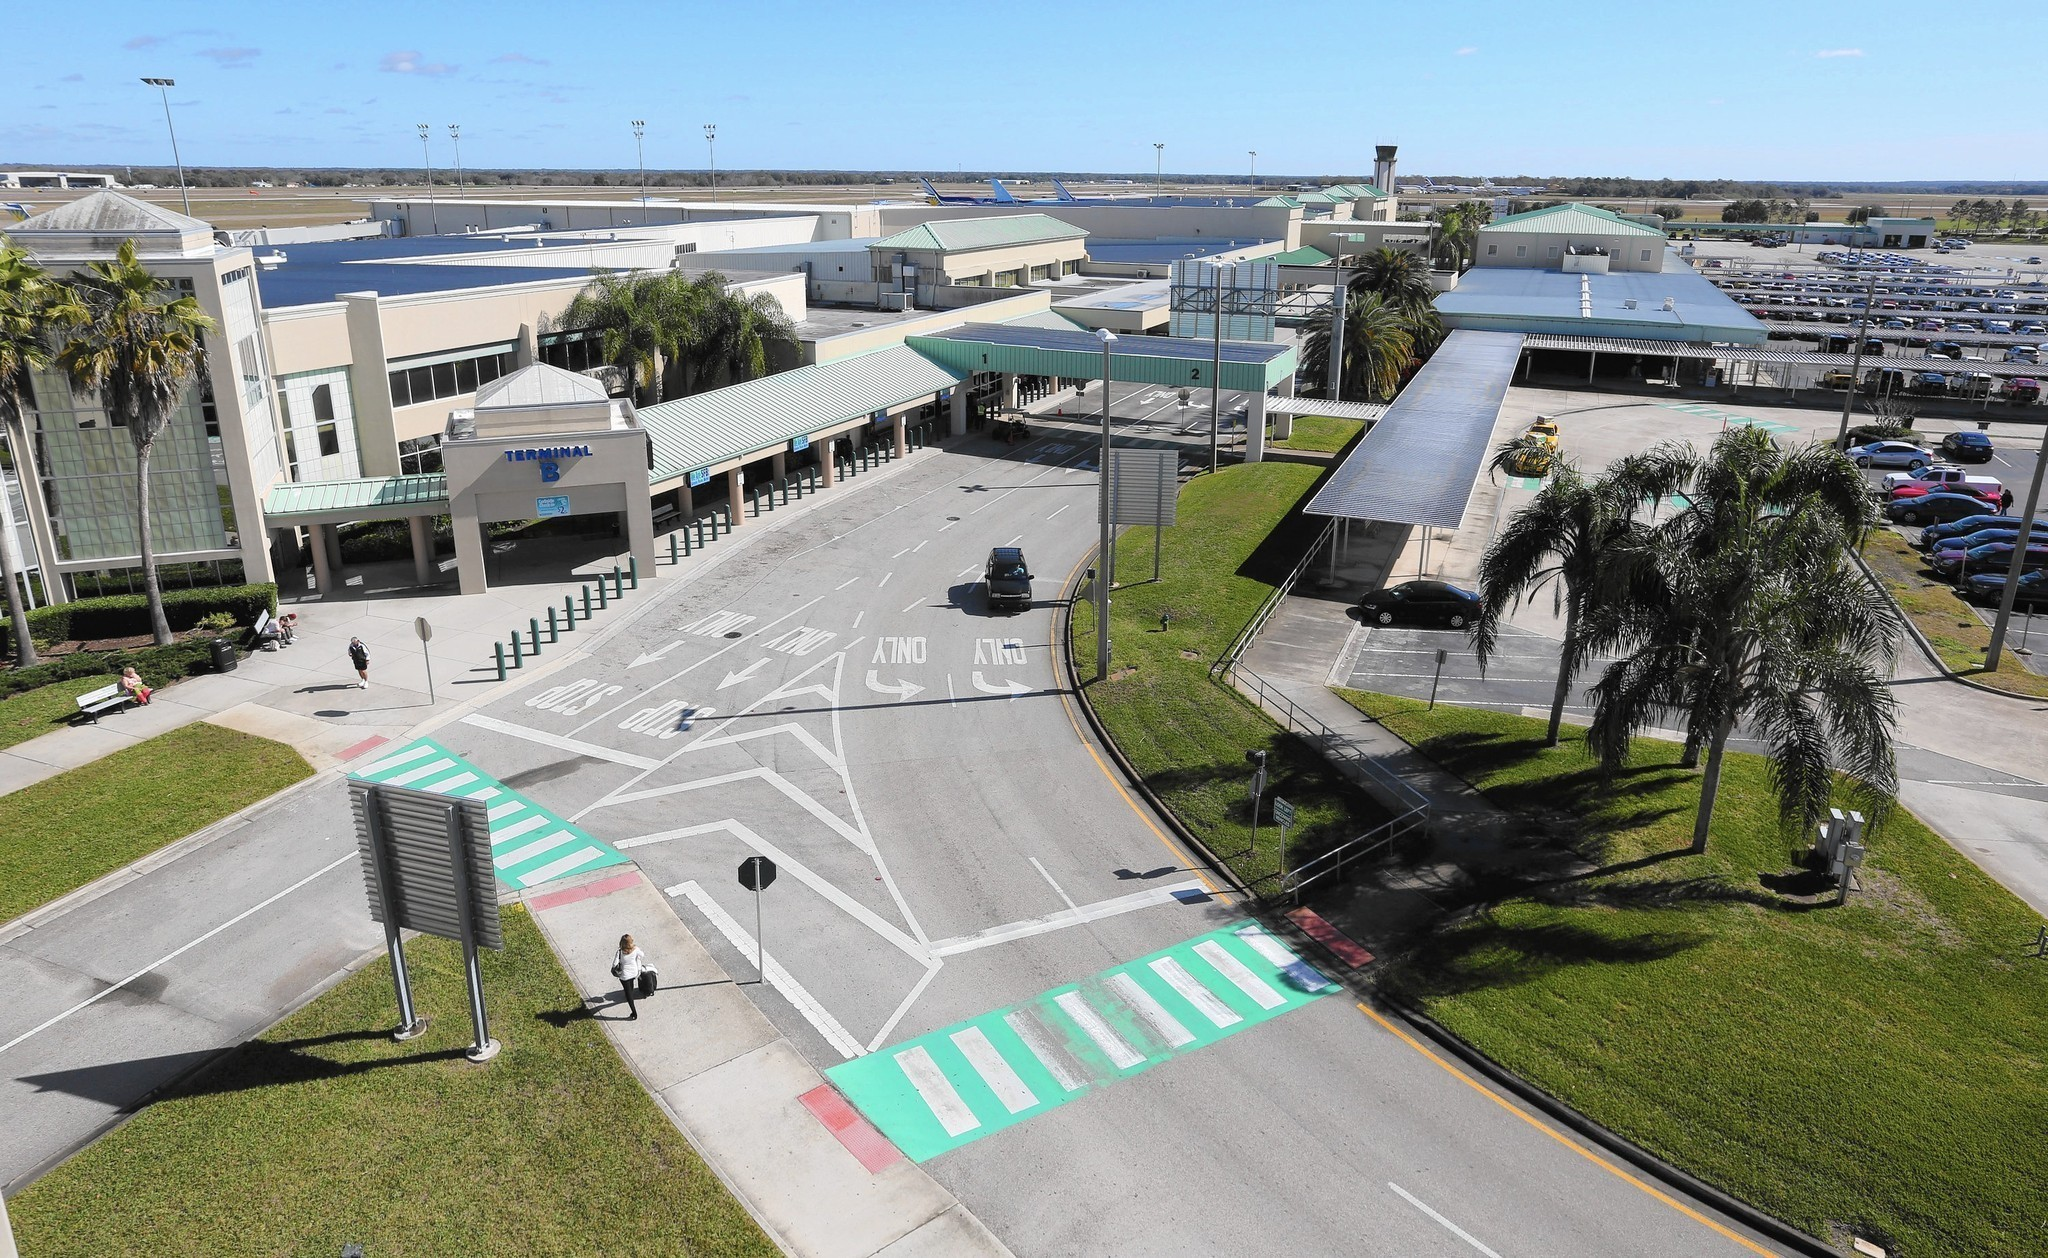 florida sanford airport